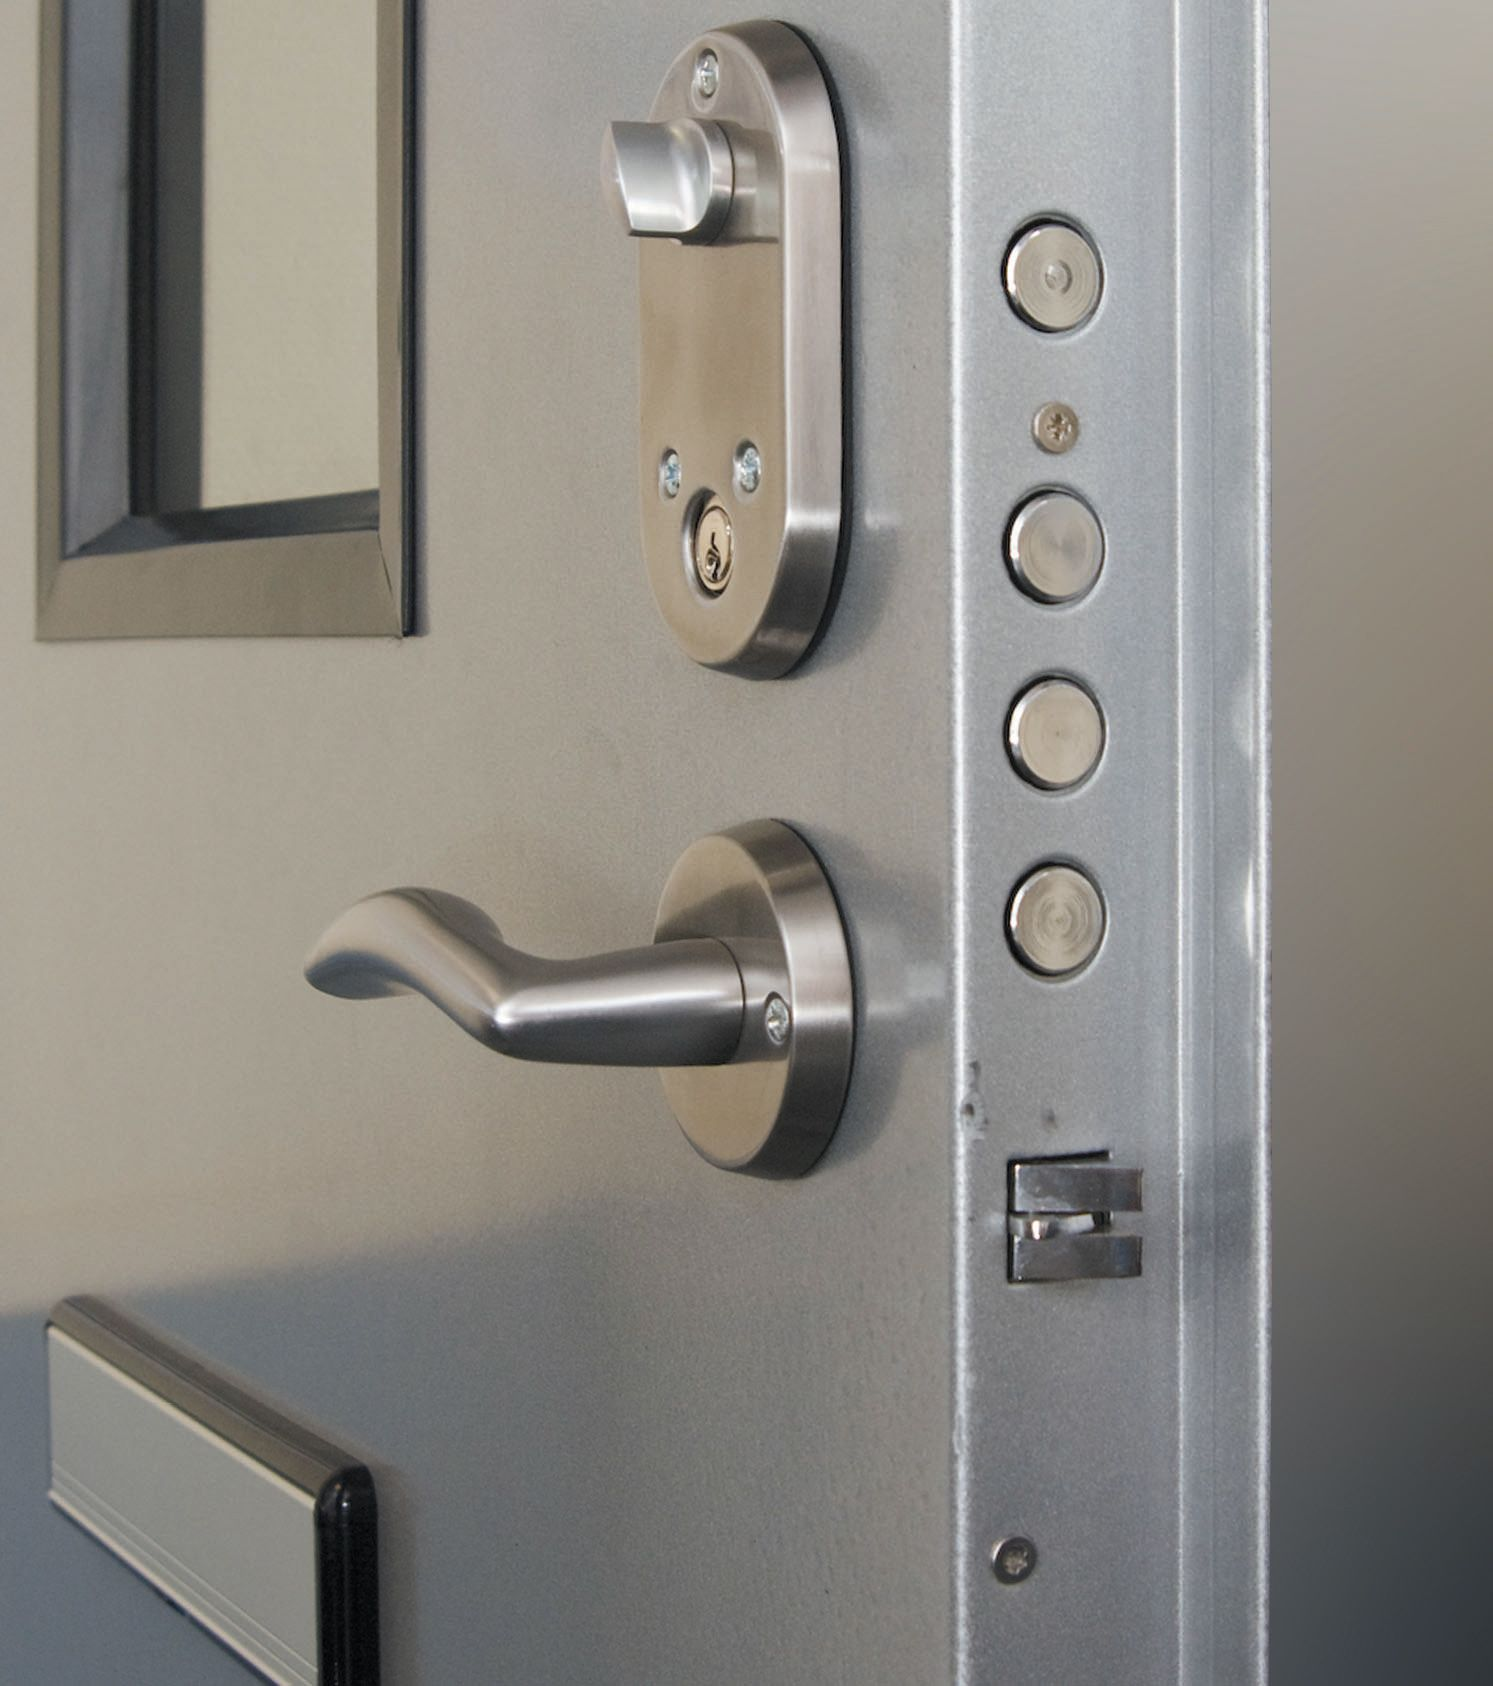 Interior door security systems provide you 24-7 safety & Interior door security systems provide you 24-7 safety   Nice ... Pezcame.Com